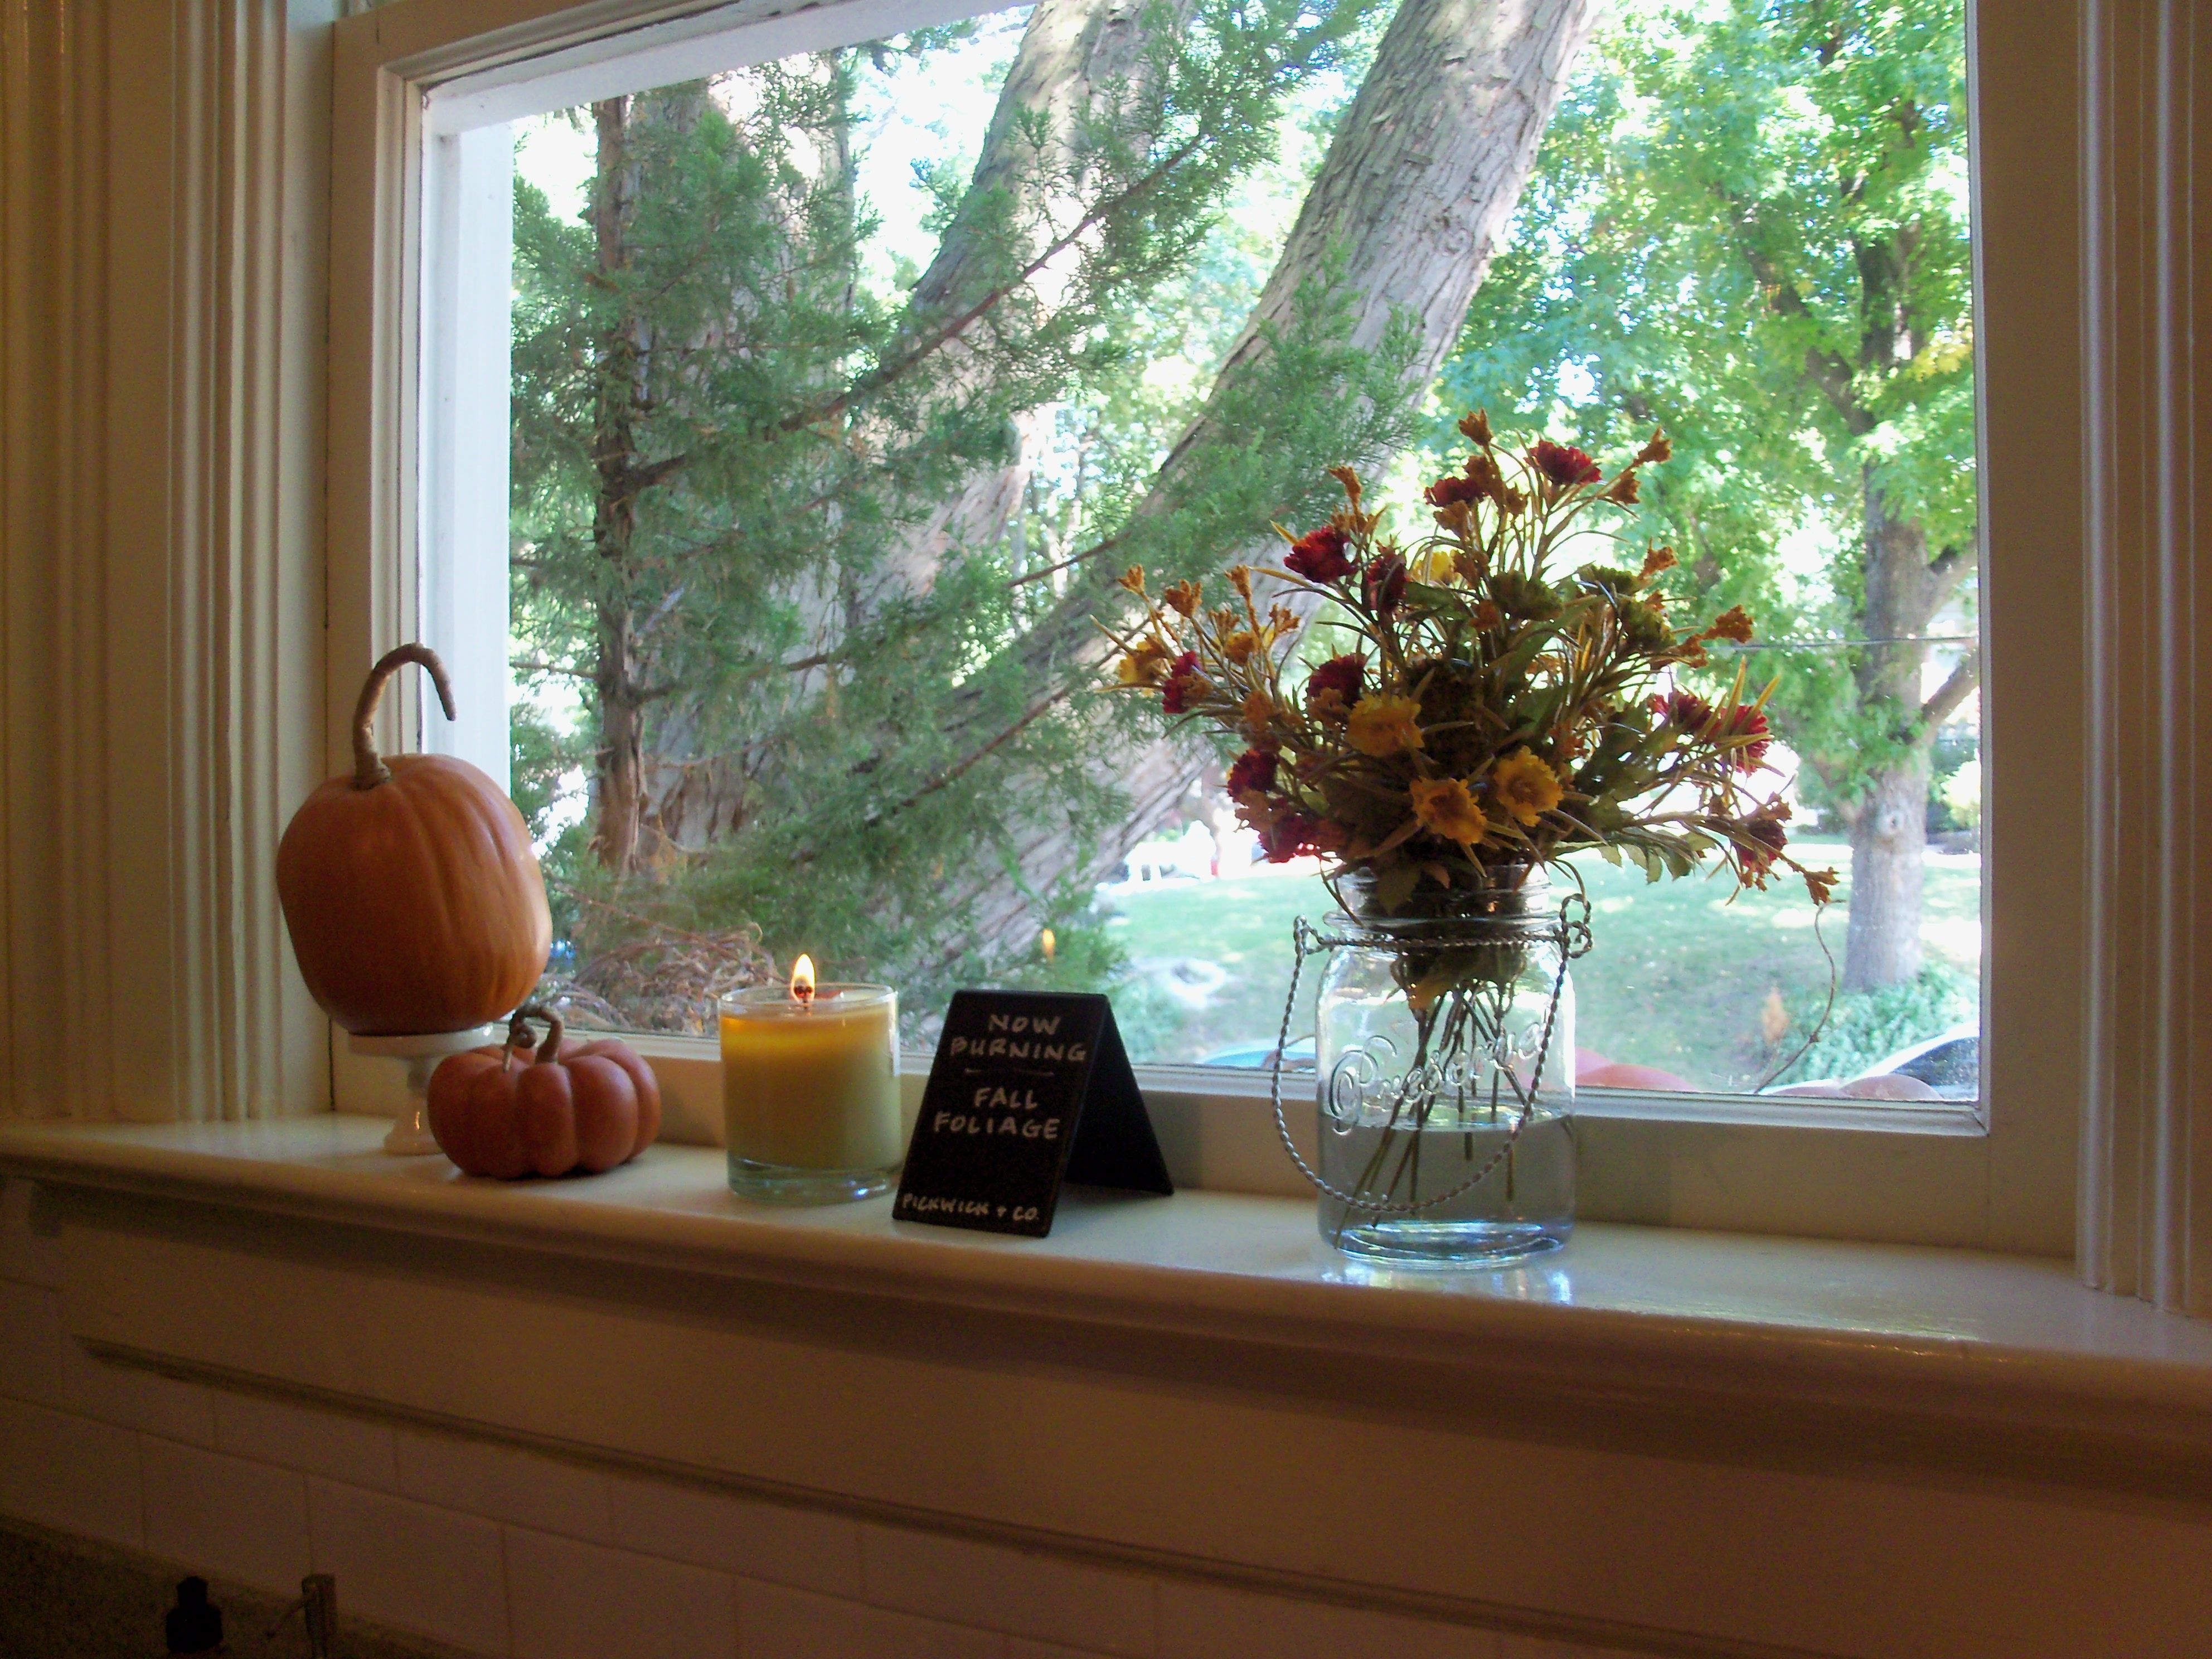 Fall window decor in the window pinterest for Autumn window decoration